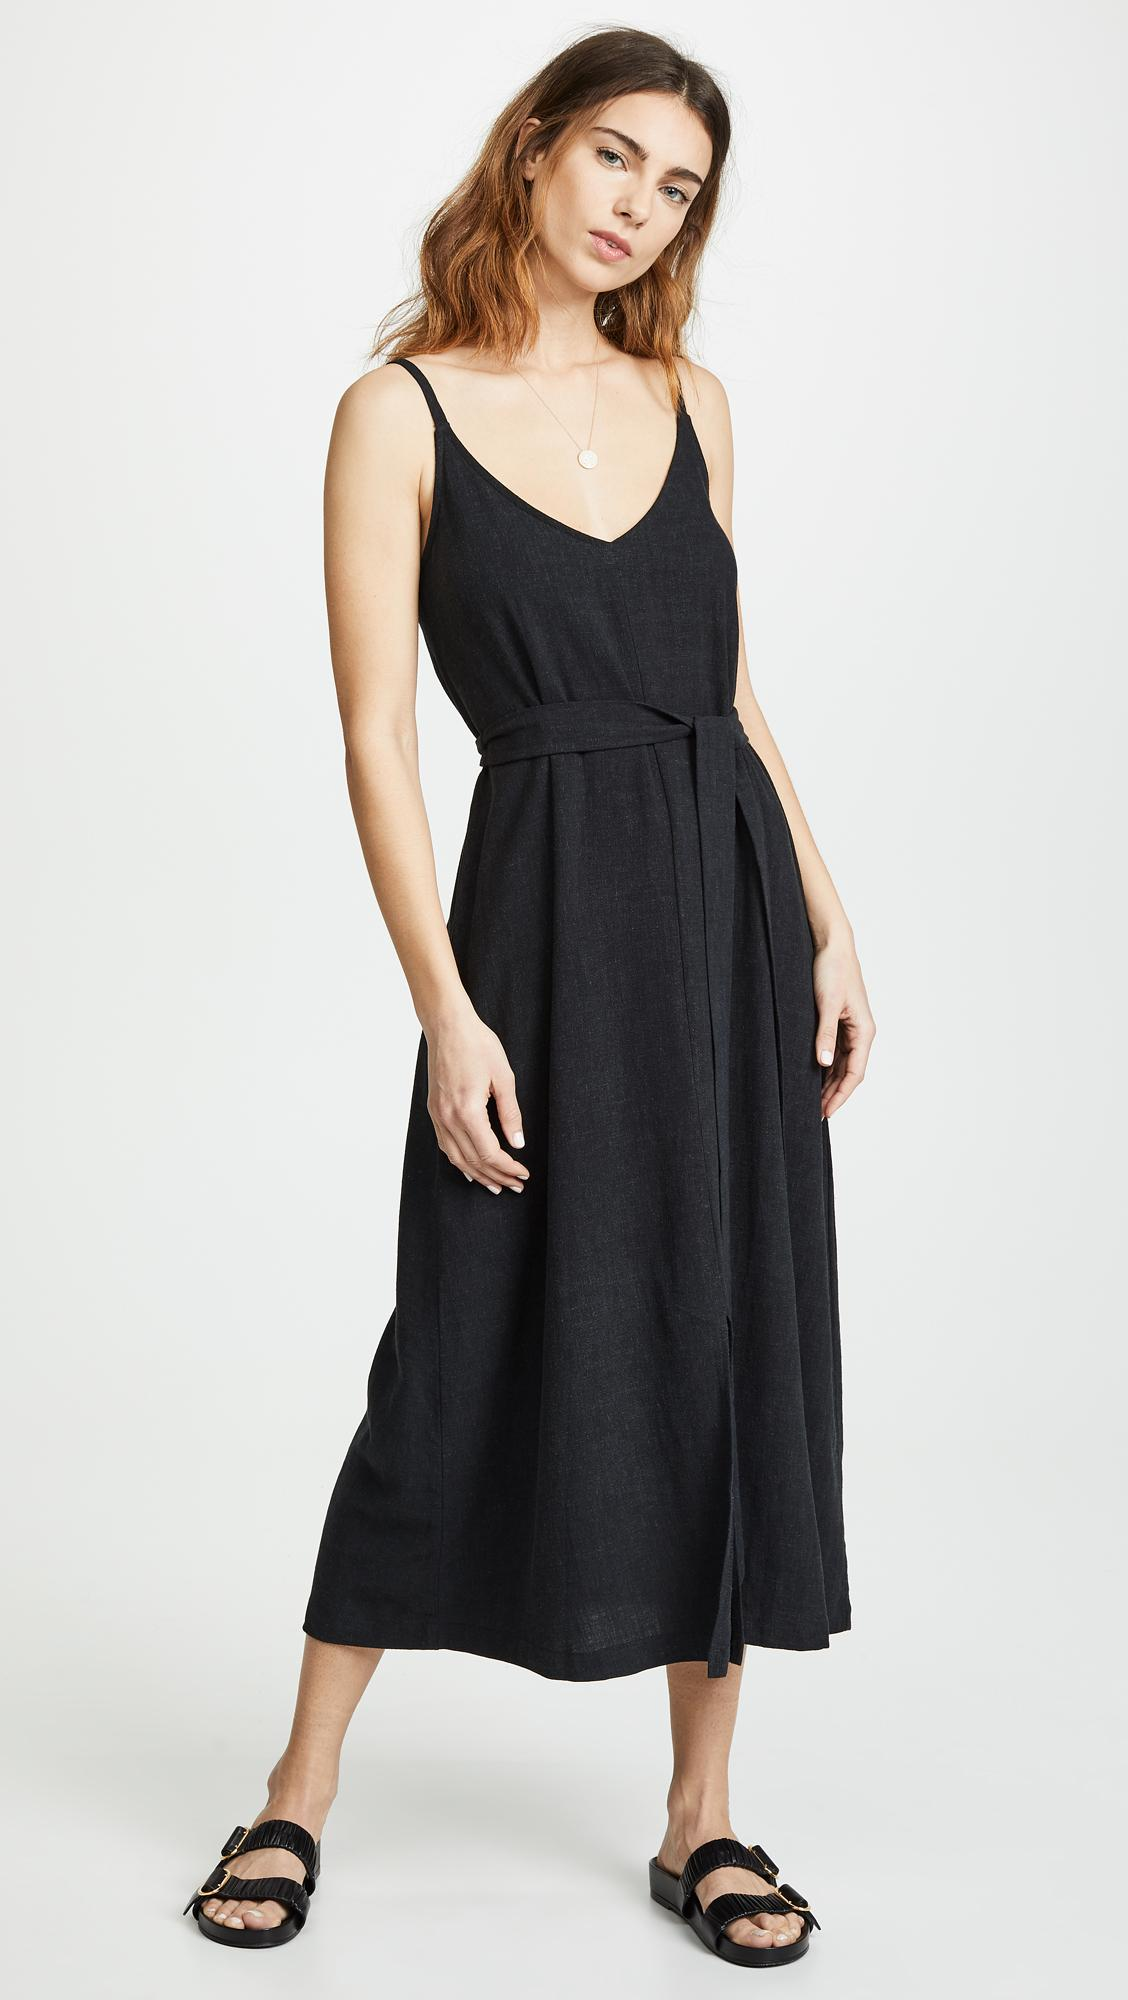 be6ae987317 Lyst - Rachel Pally Tallulah Dress in Black